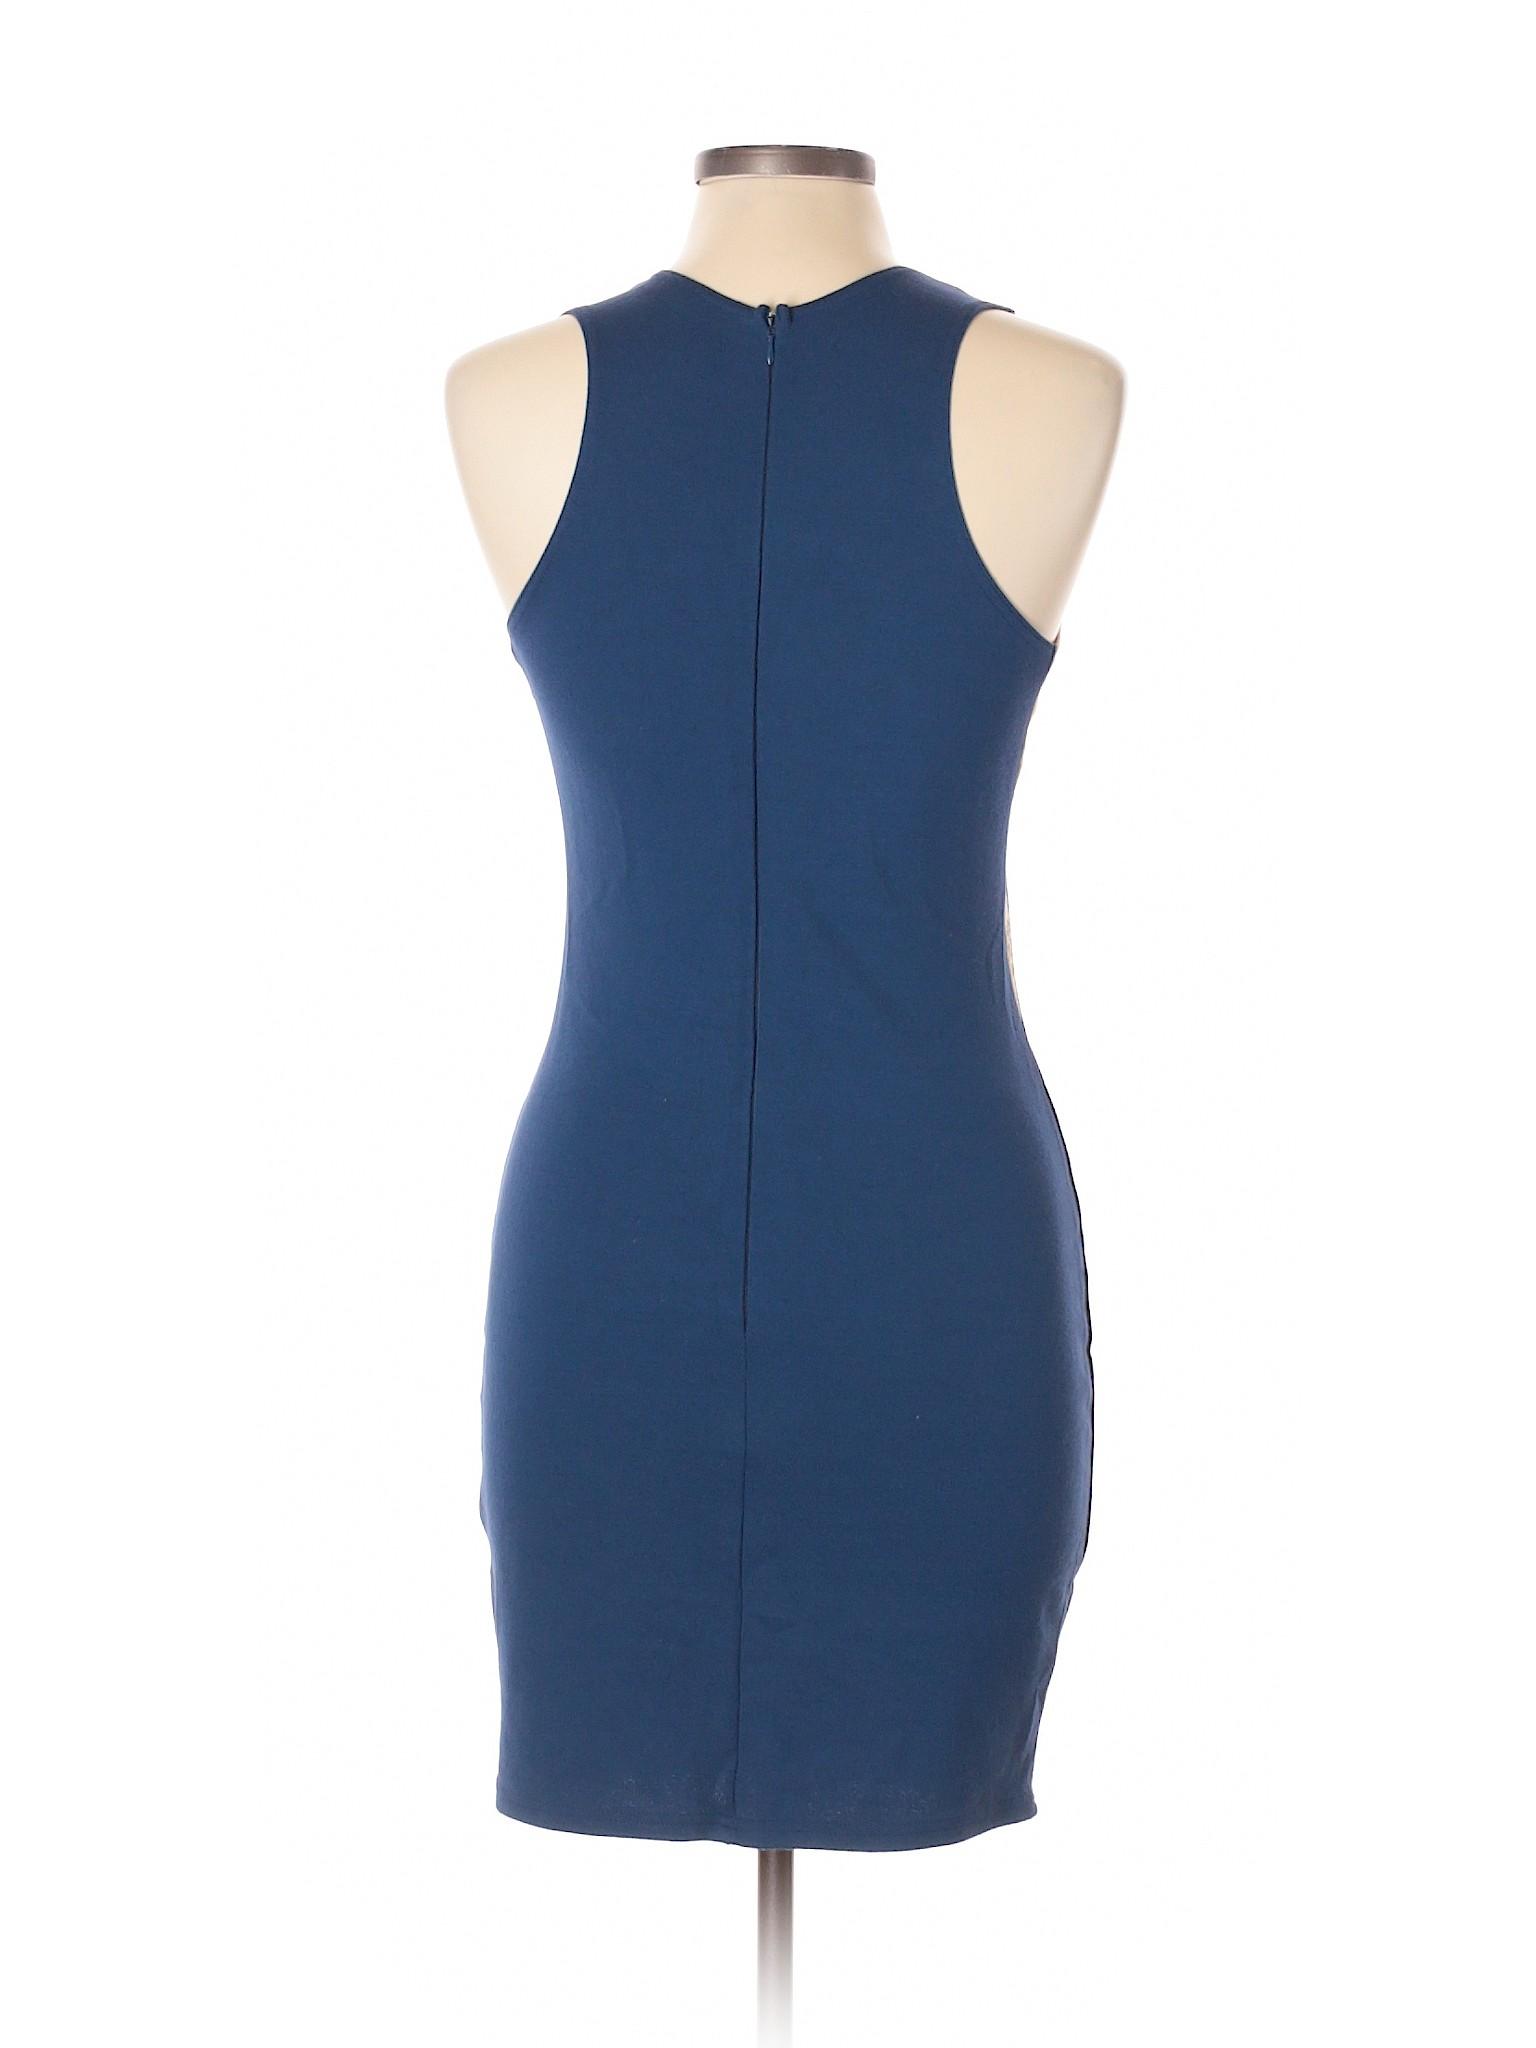 Venus Venus Selling Casual Casual Dress Selling Dress qaqPpRwZ